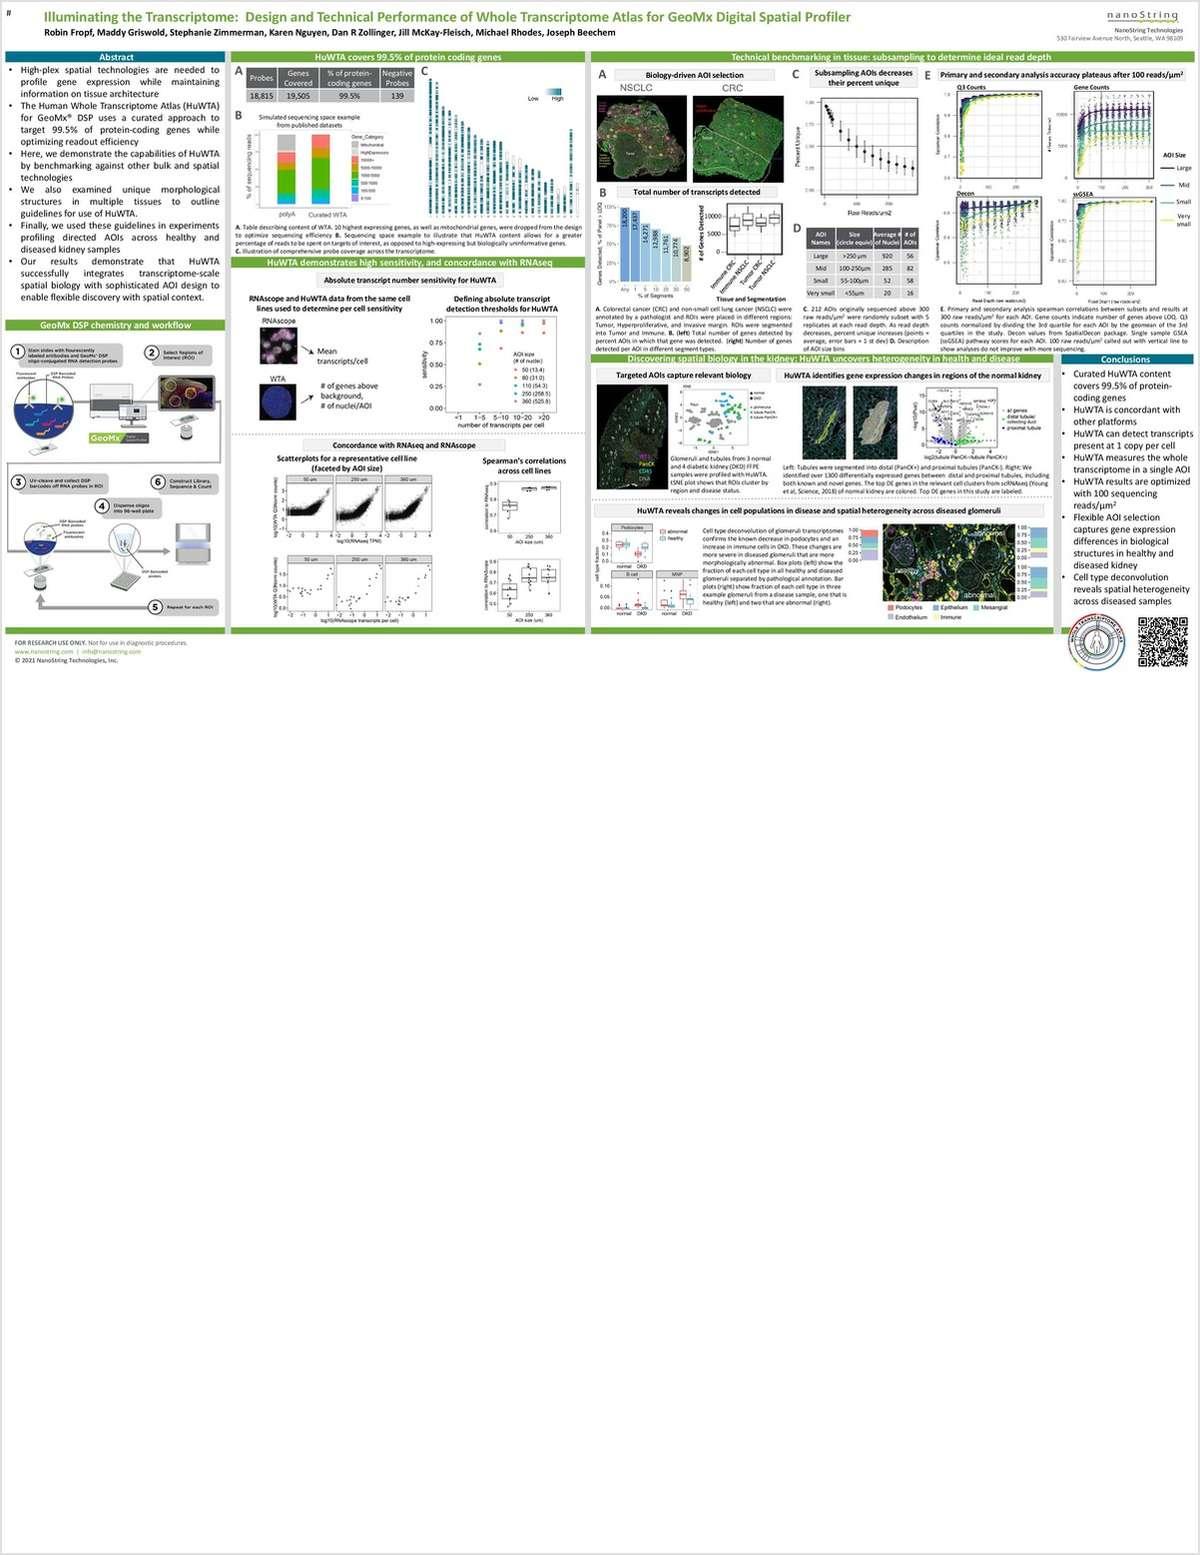 Illuminating the Transcriptome: Design and Technical Performance of Whole Transcriptome Atlas for GeoMx Digital Spatial Profiler